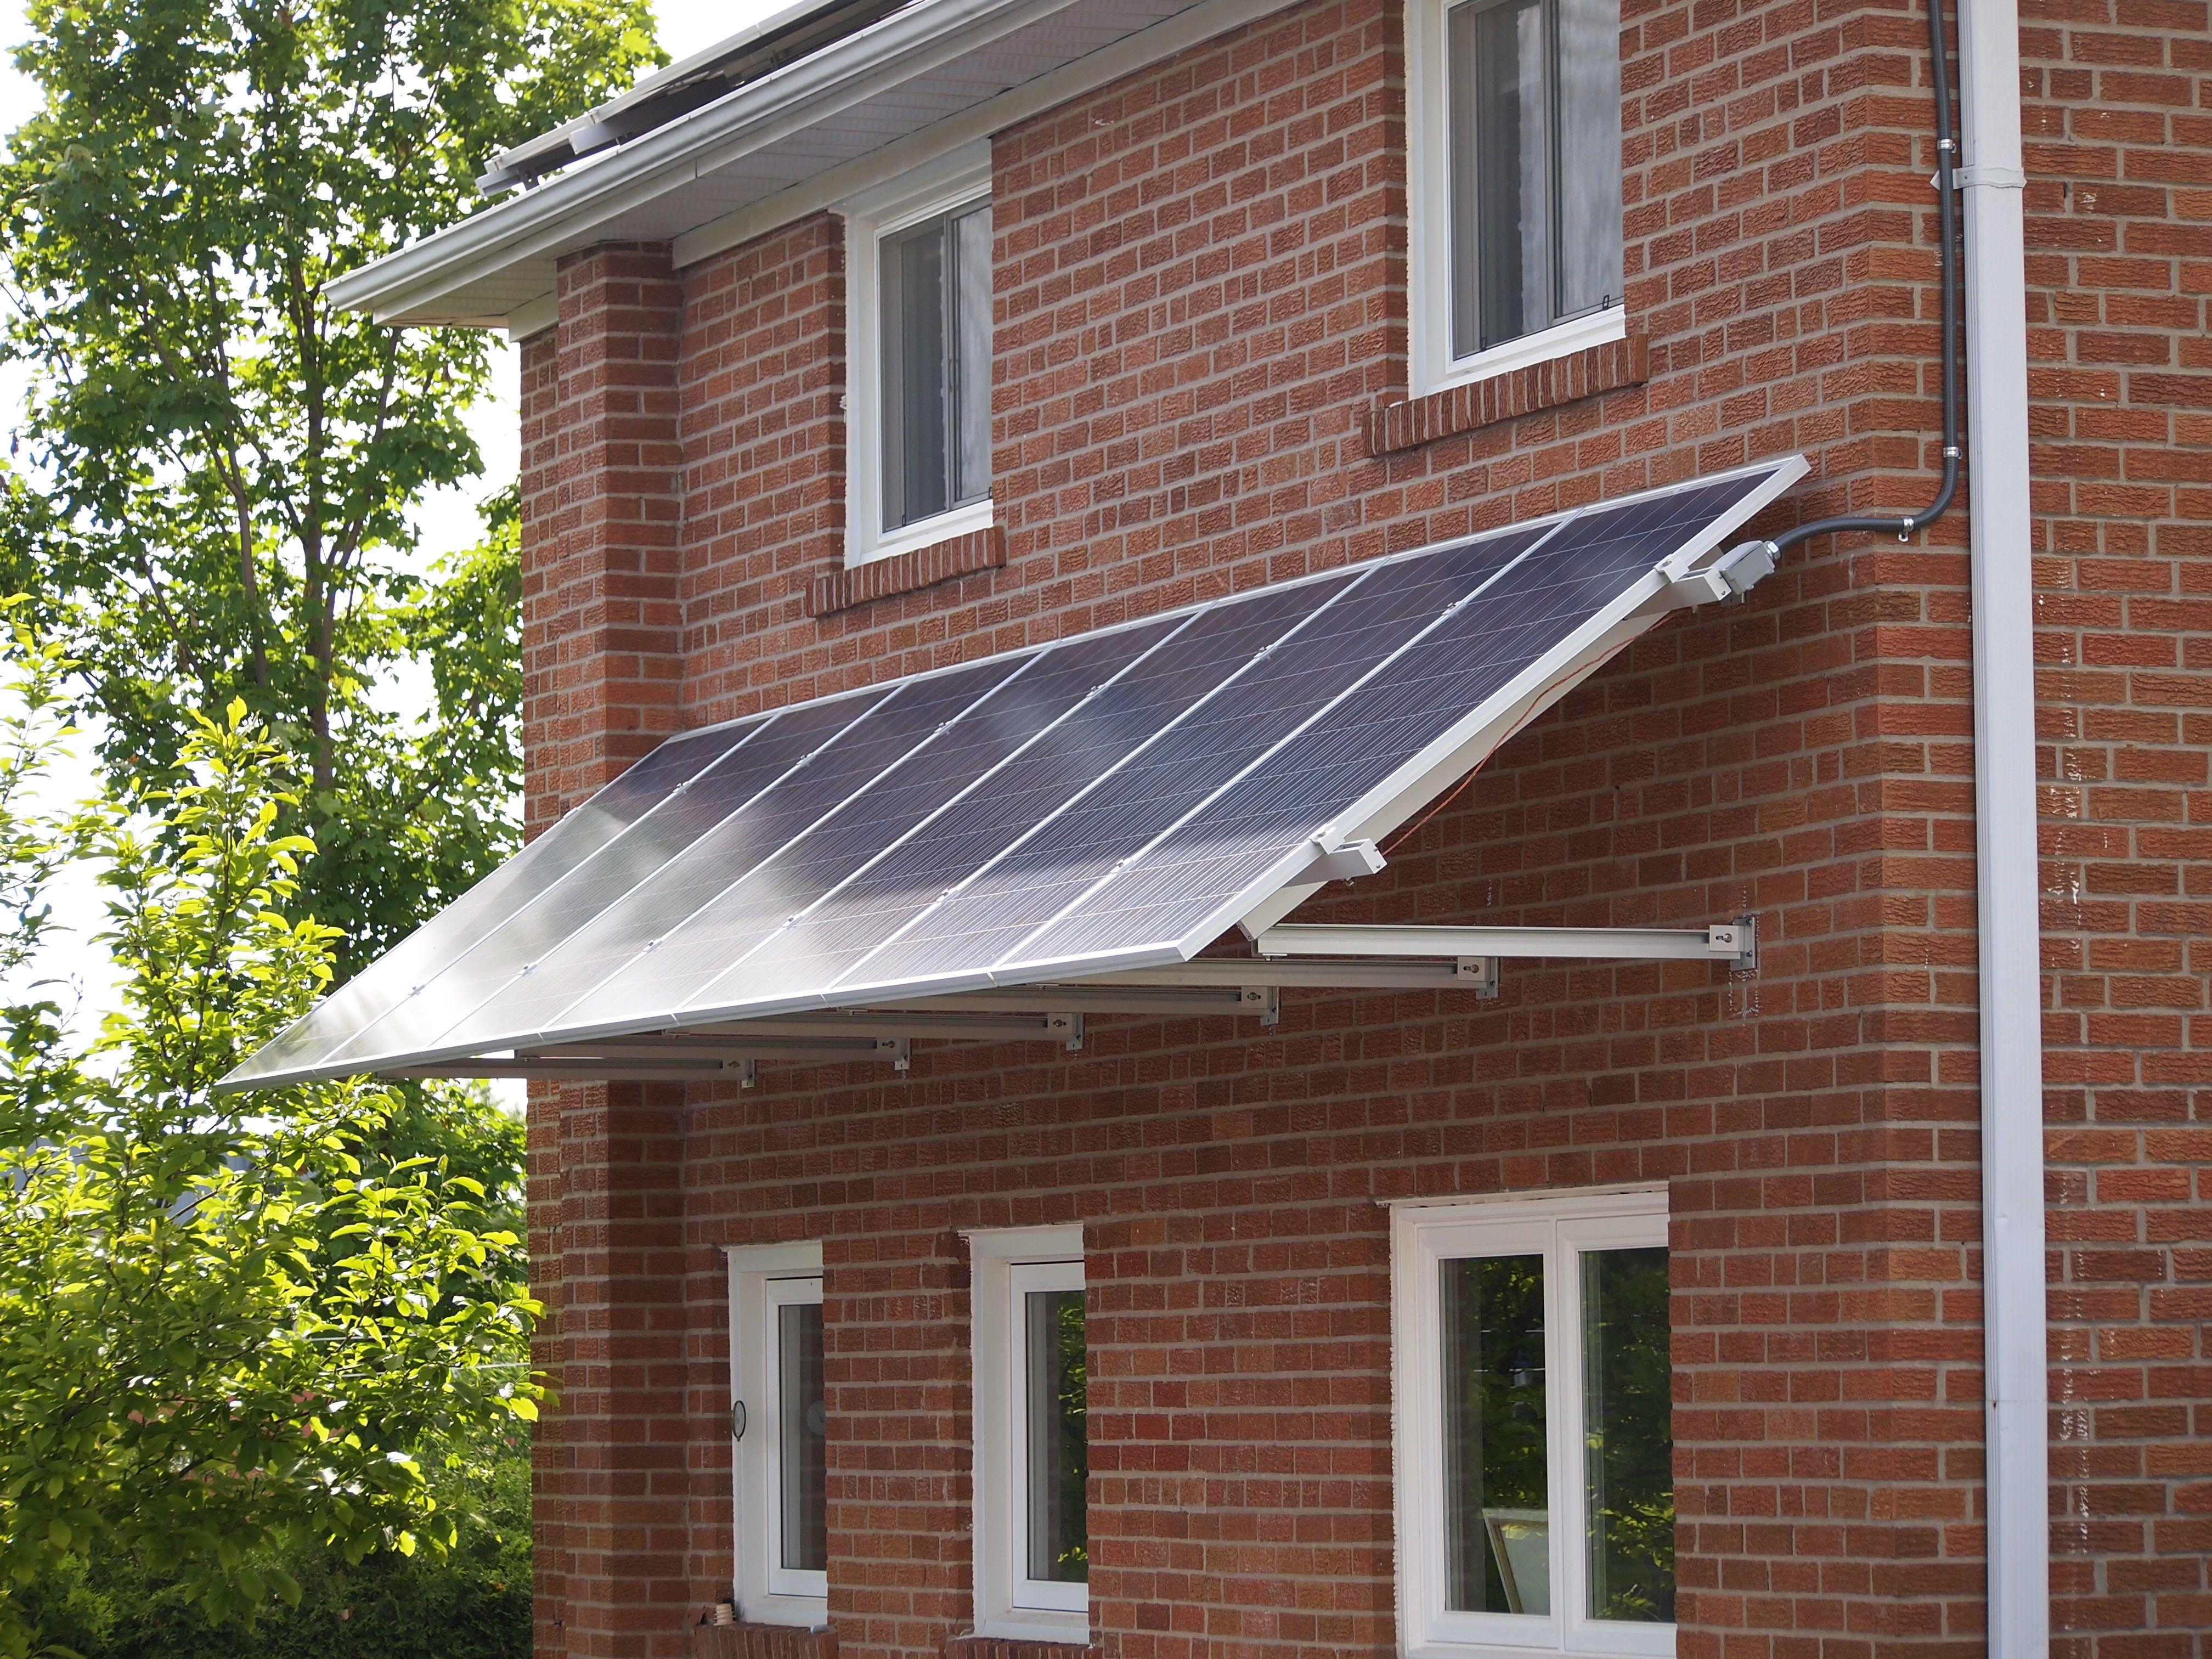 Wall Mounted Window Trellises Solar Panels Outdoor Decor